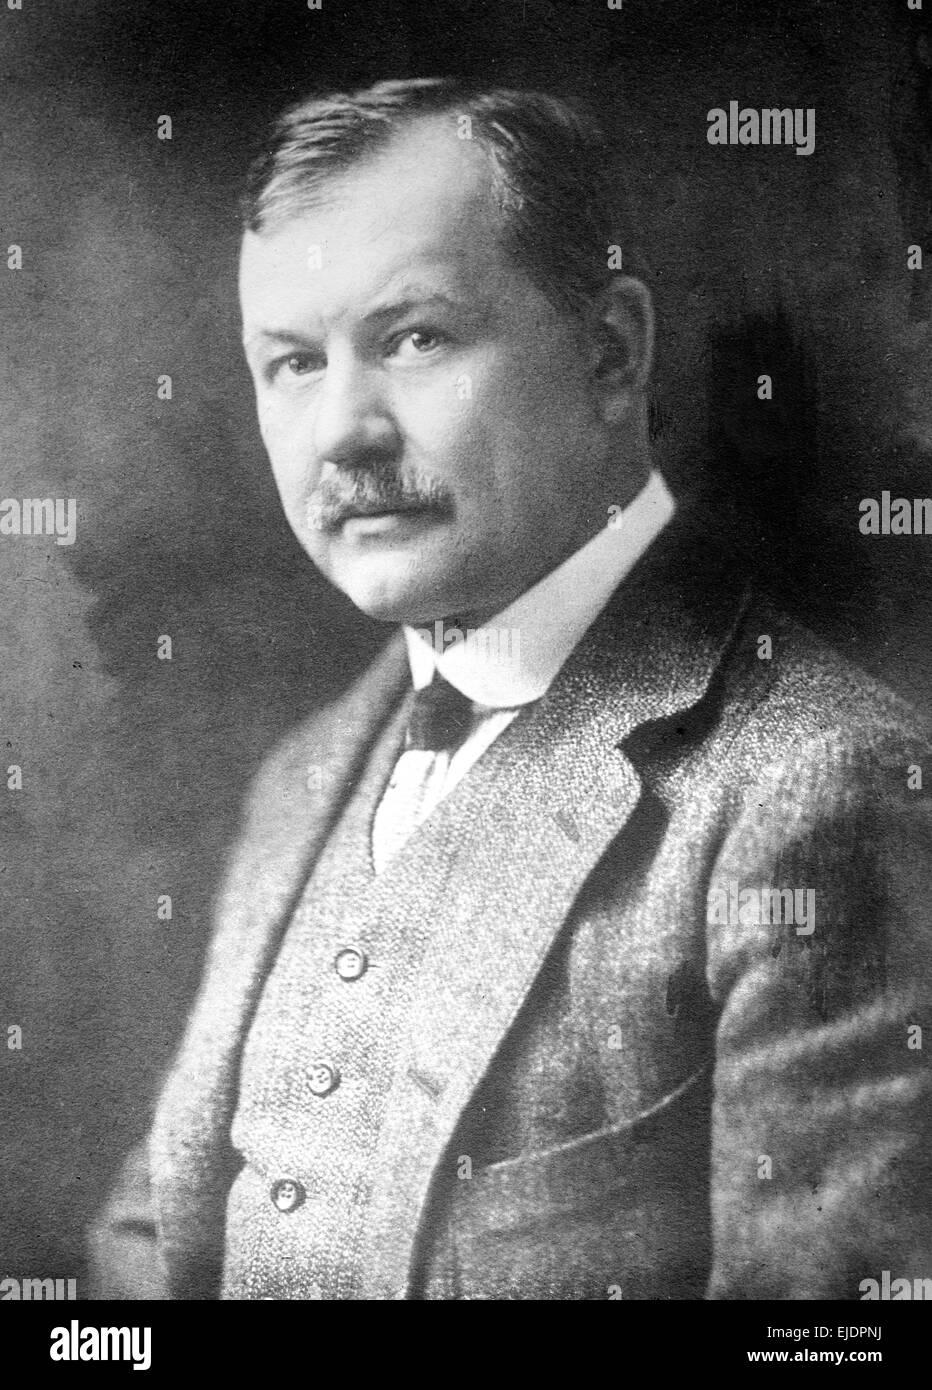 Franz Lehár, Austro-Hungarian composer. - Stock Image